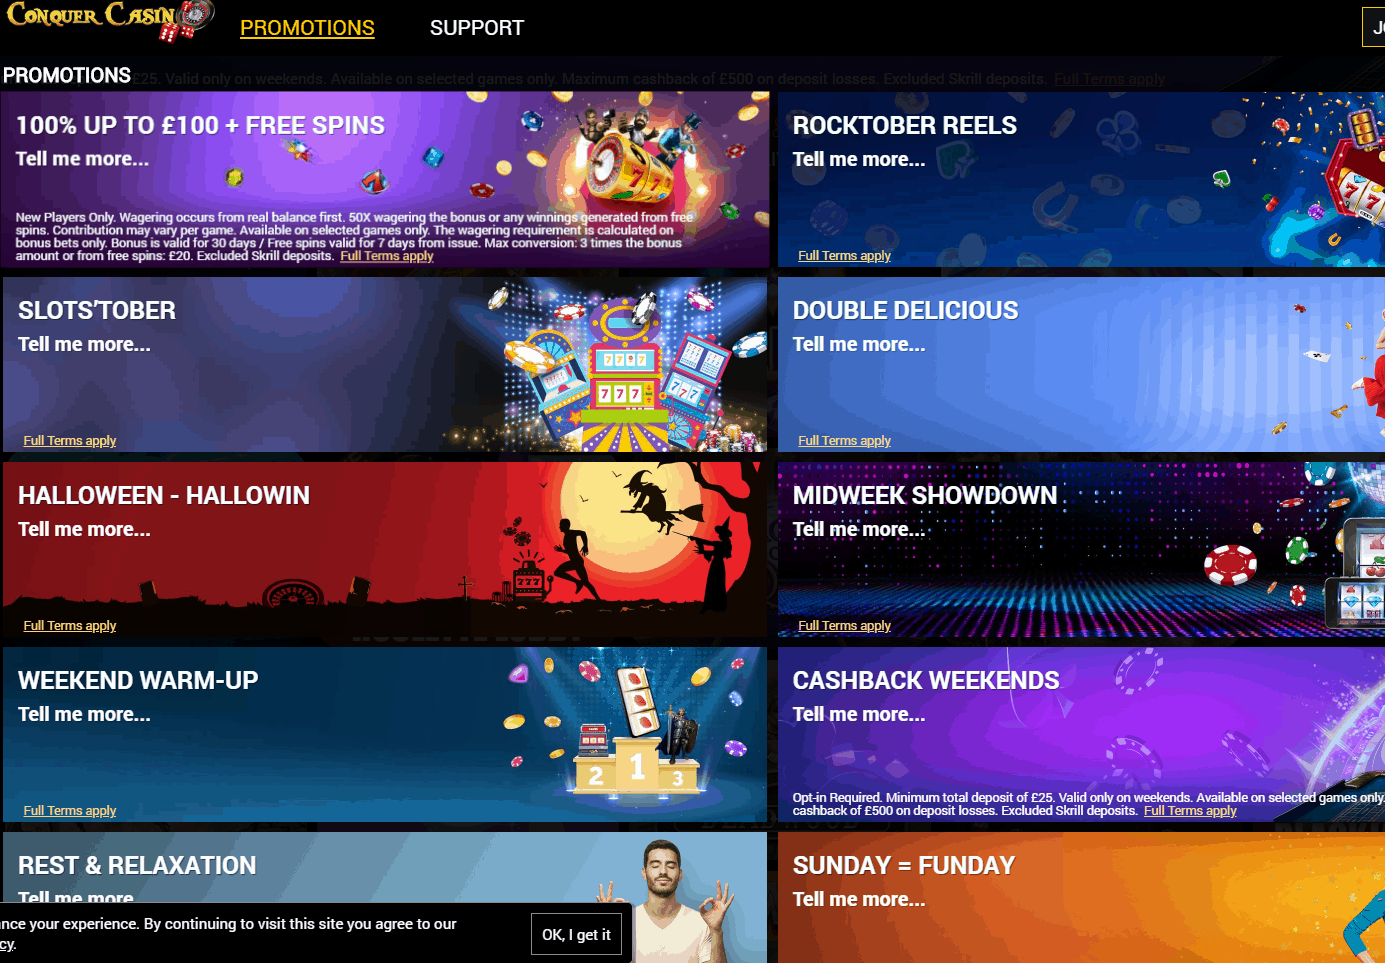 conquer-casino-promotions